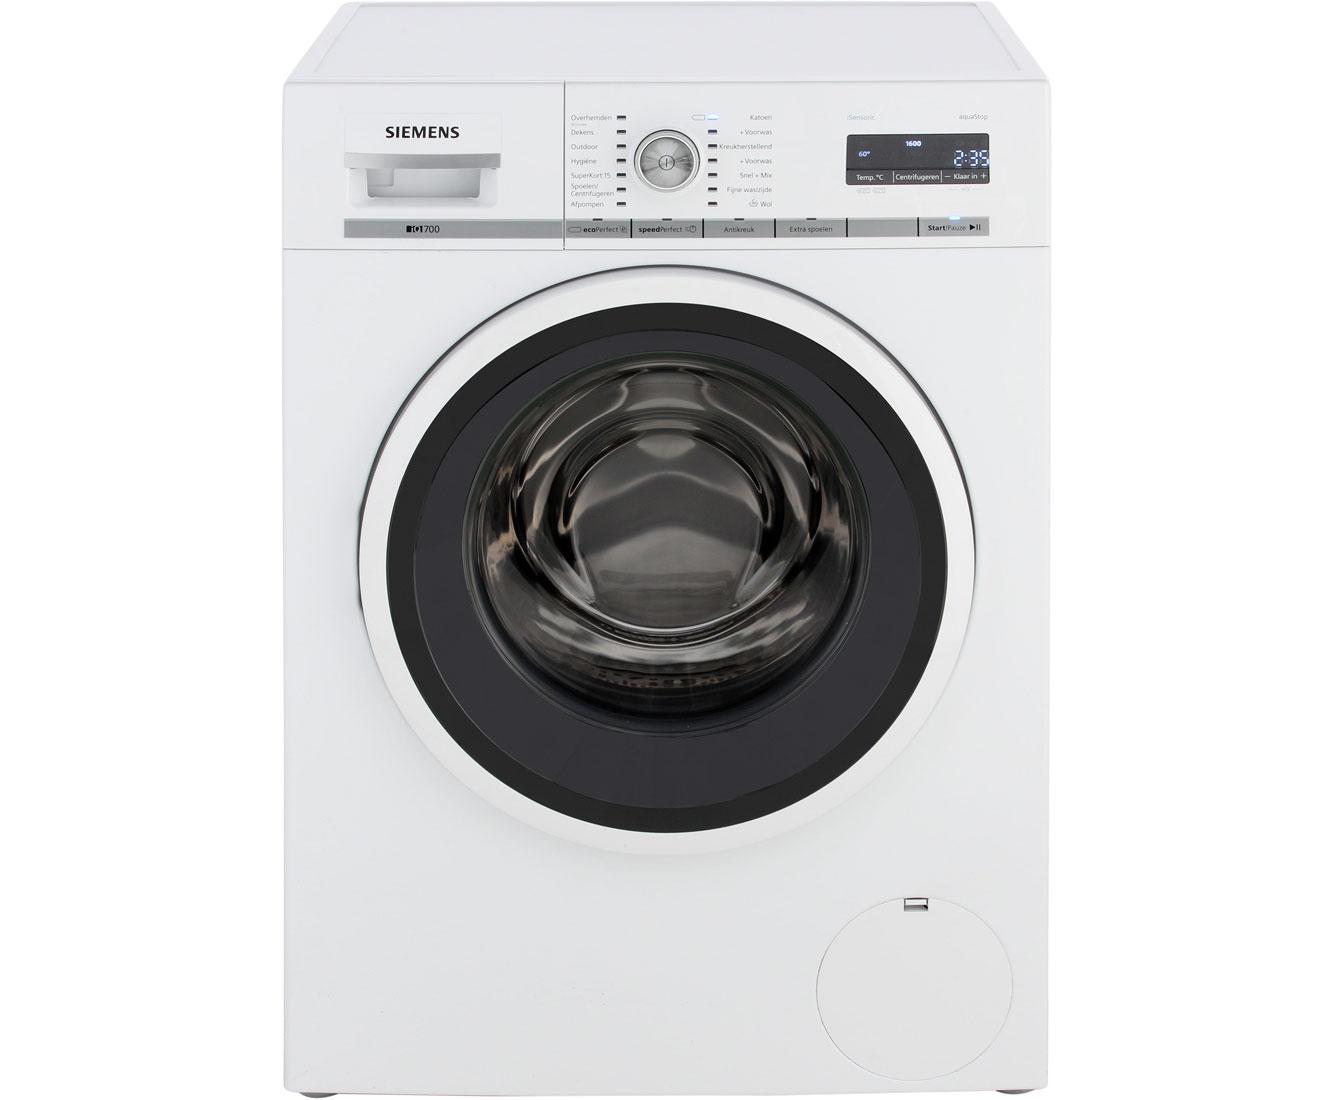 [PRIJSFOUT?] Siemens iQ700 WM16W461NL Wasmachine voor €284 na cashback @ AO.nl